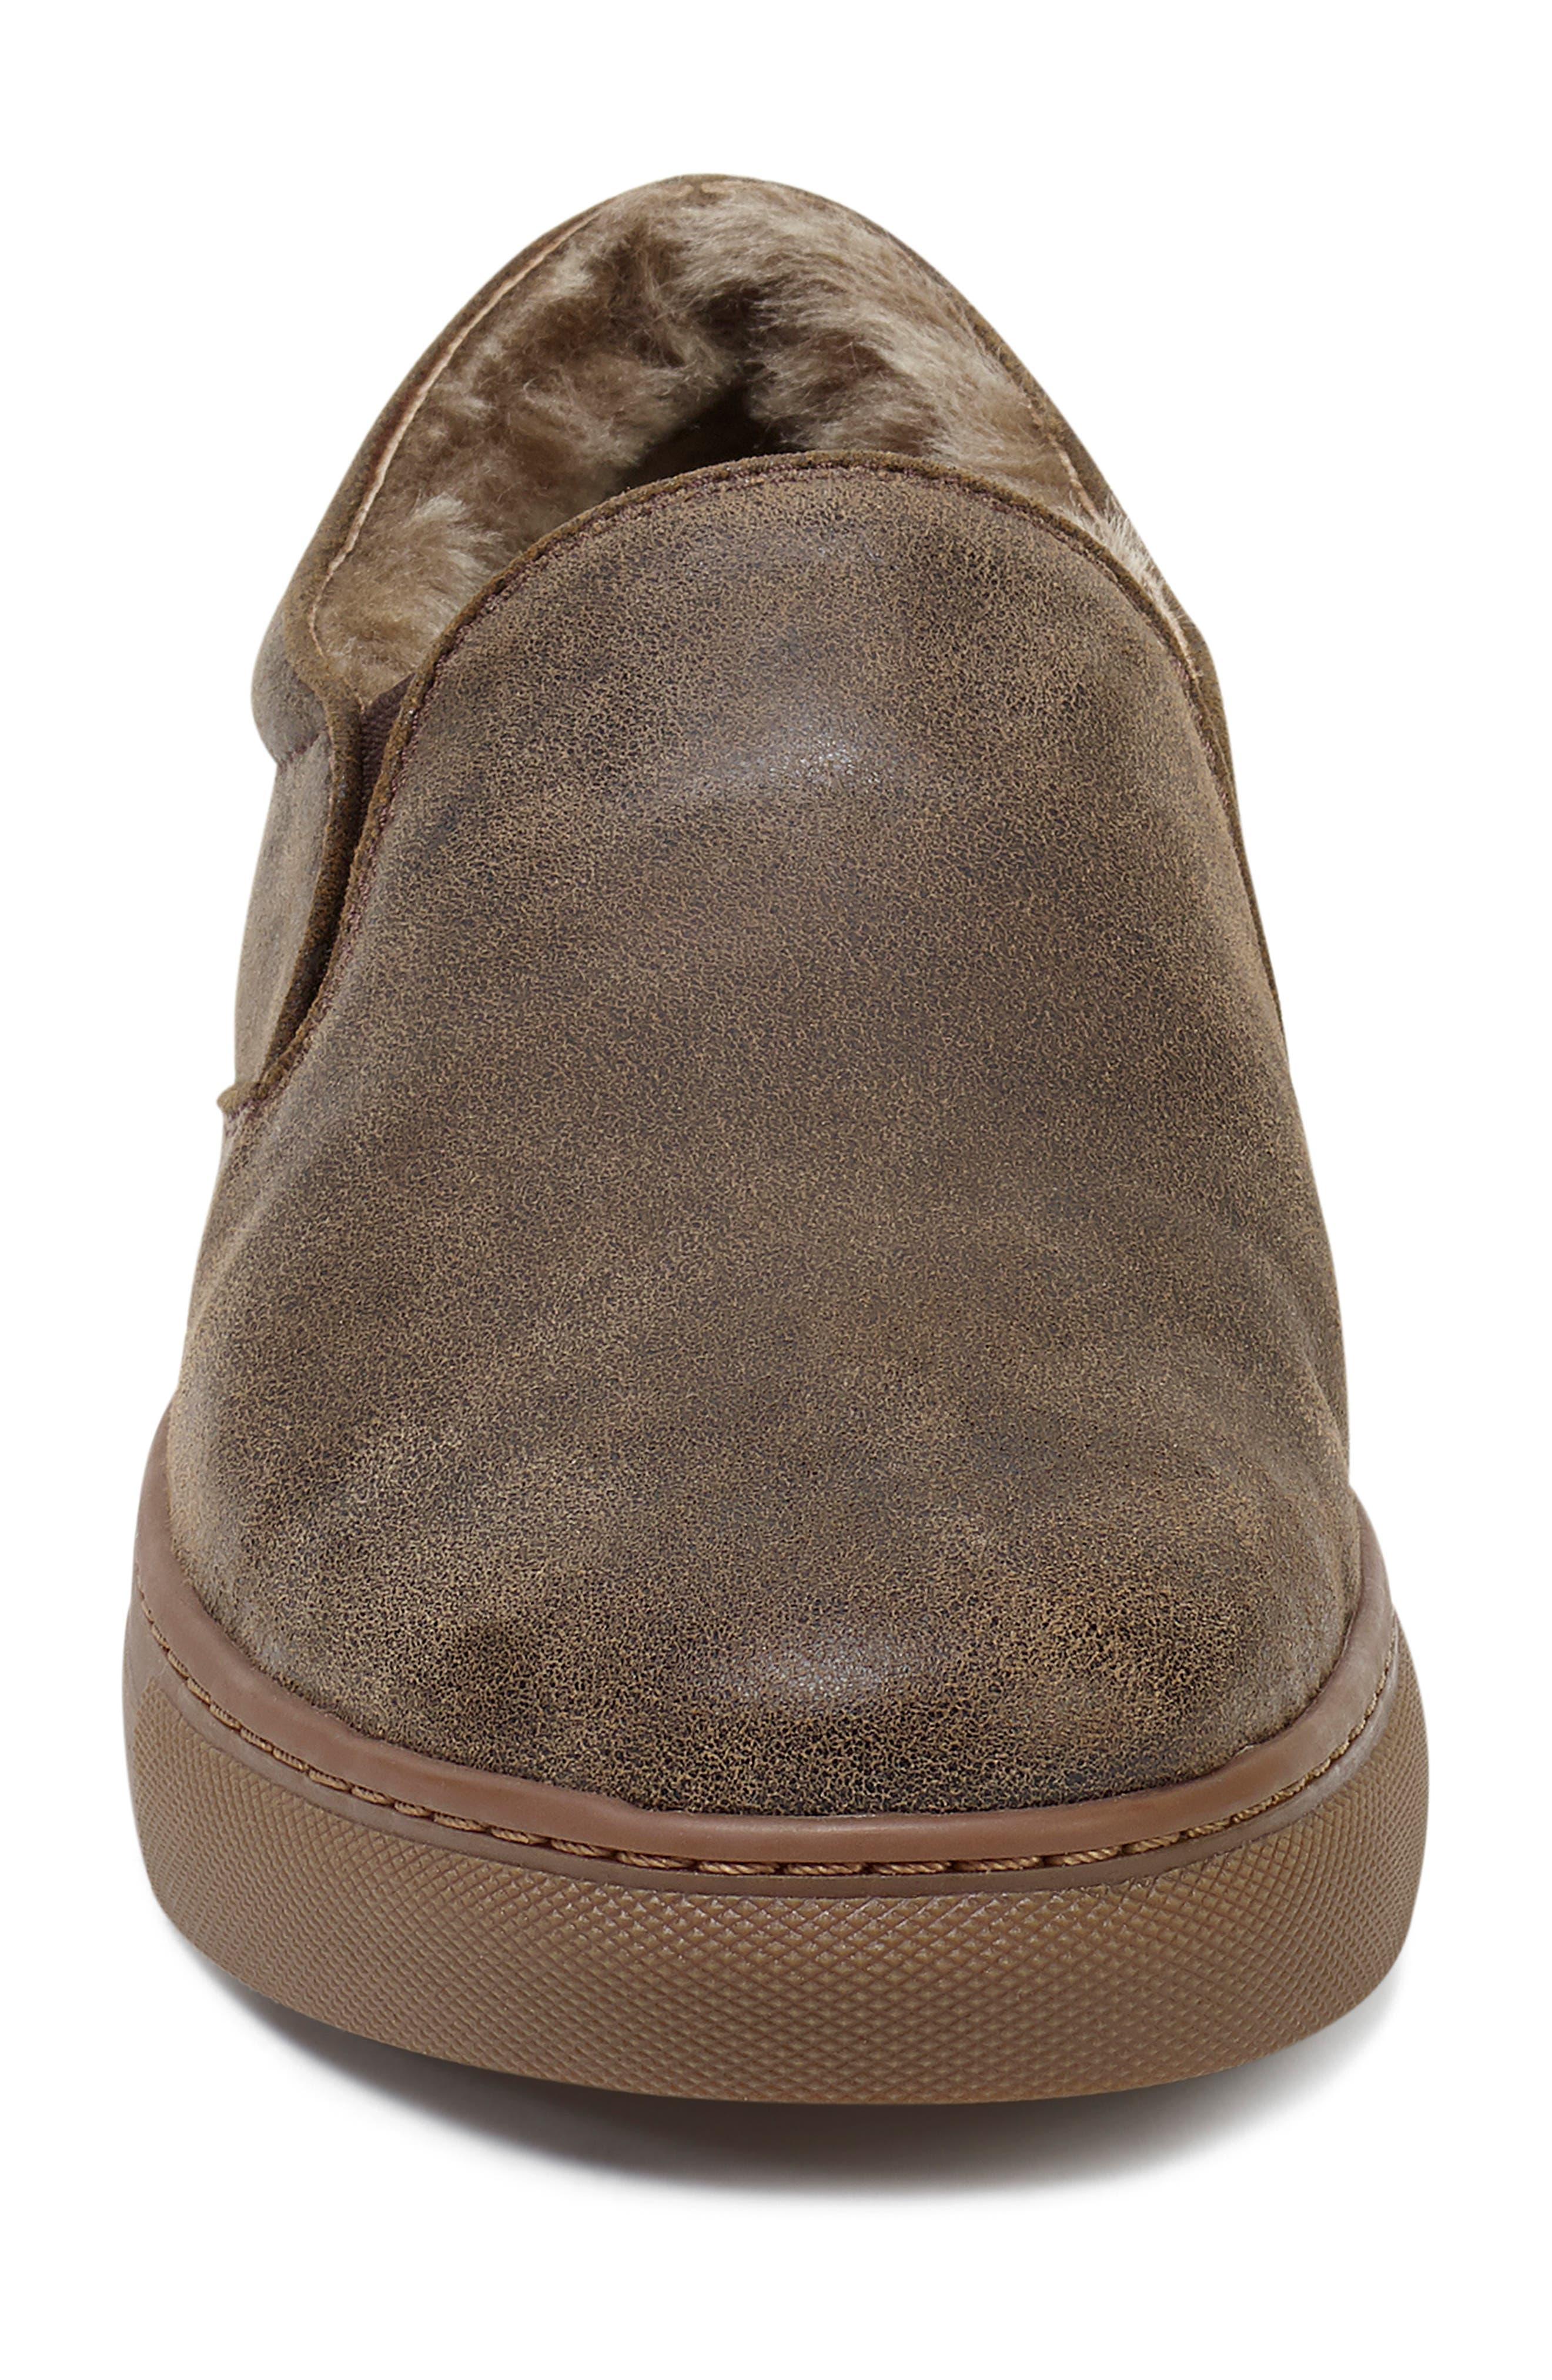 Alex Genuine Shearling Slip-On Sneaker,                             Alternate thumbnail 4, color,                             BROWN SUEDE